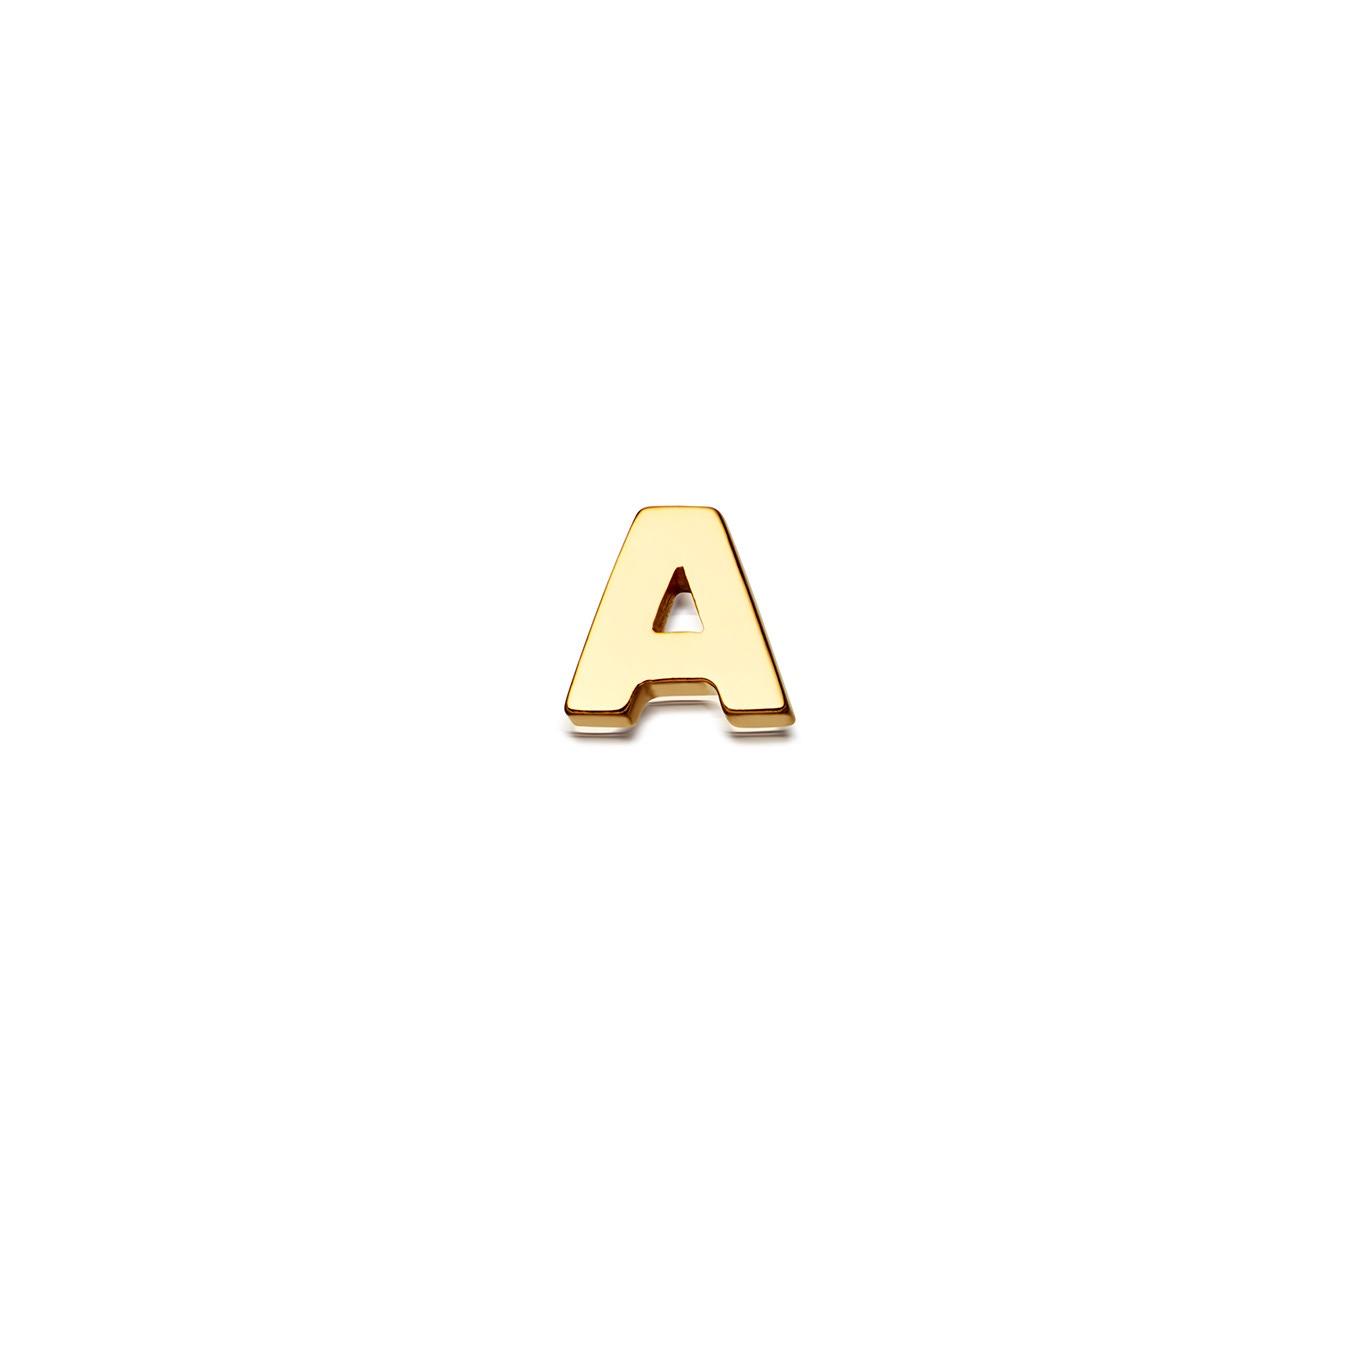 Initial 'A' Biography Pin